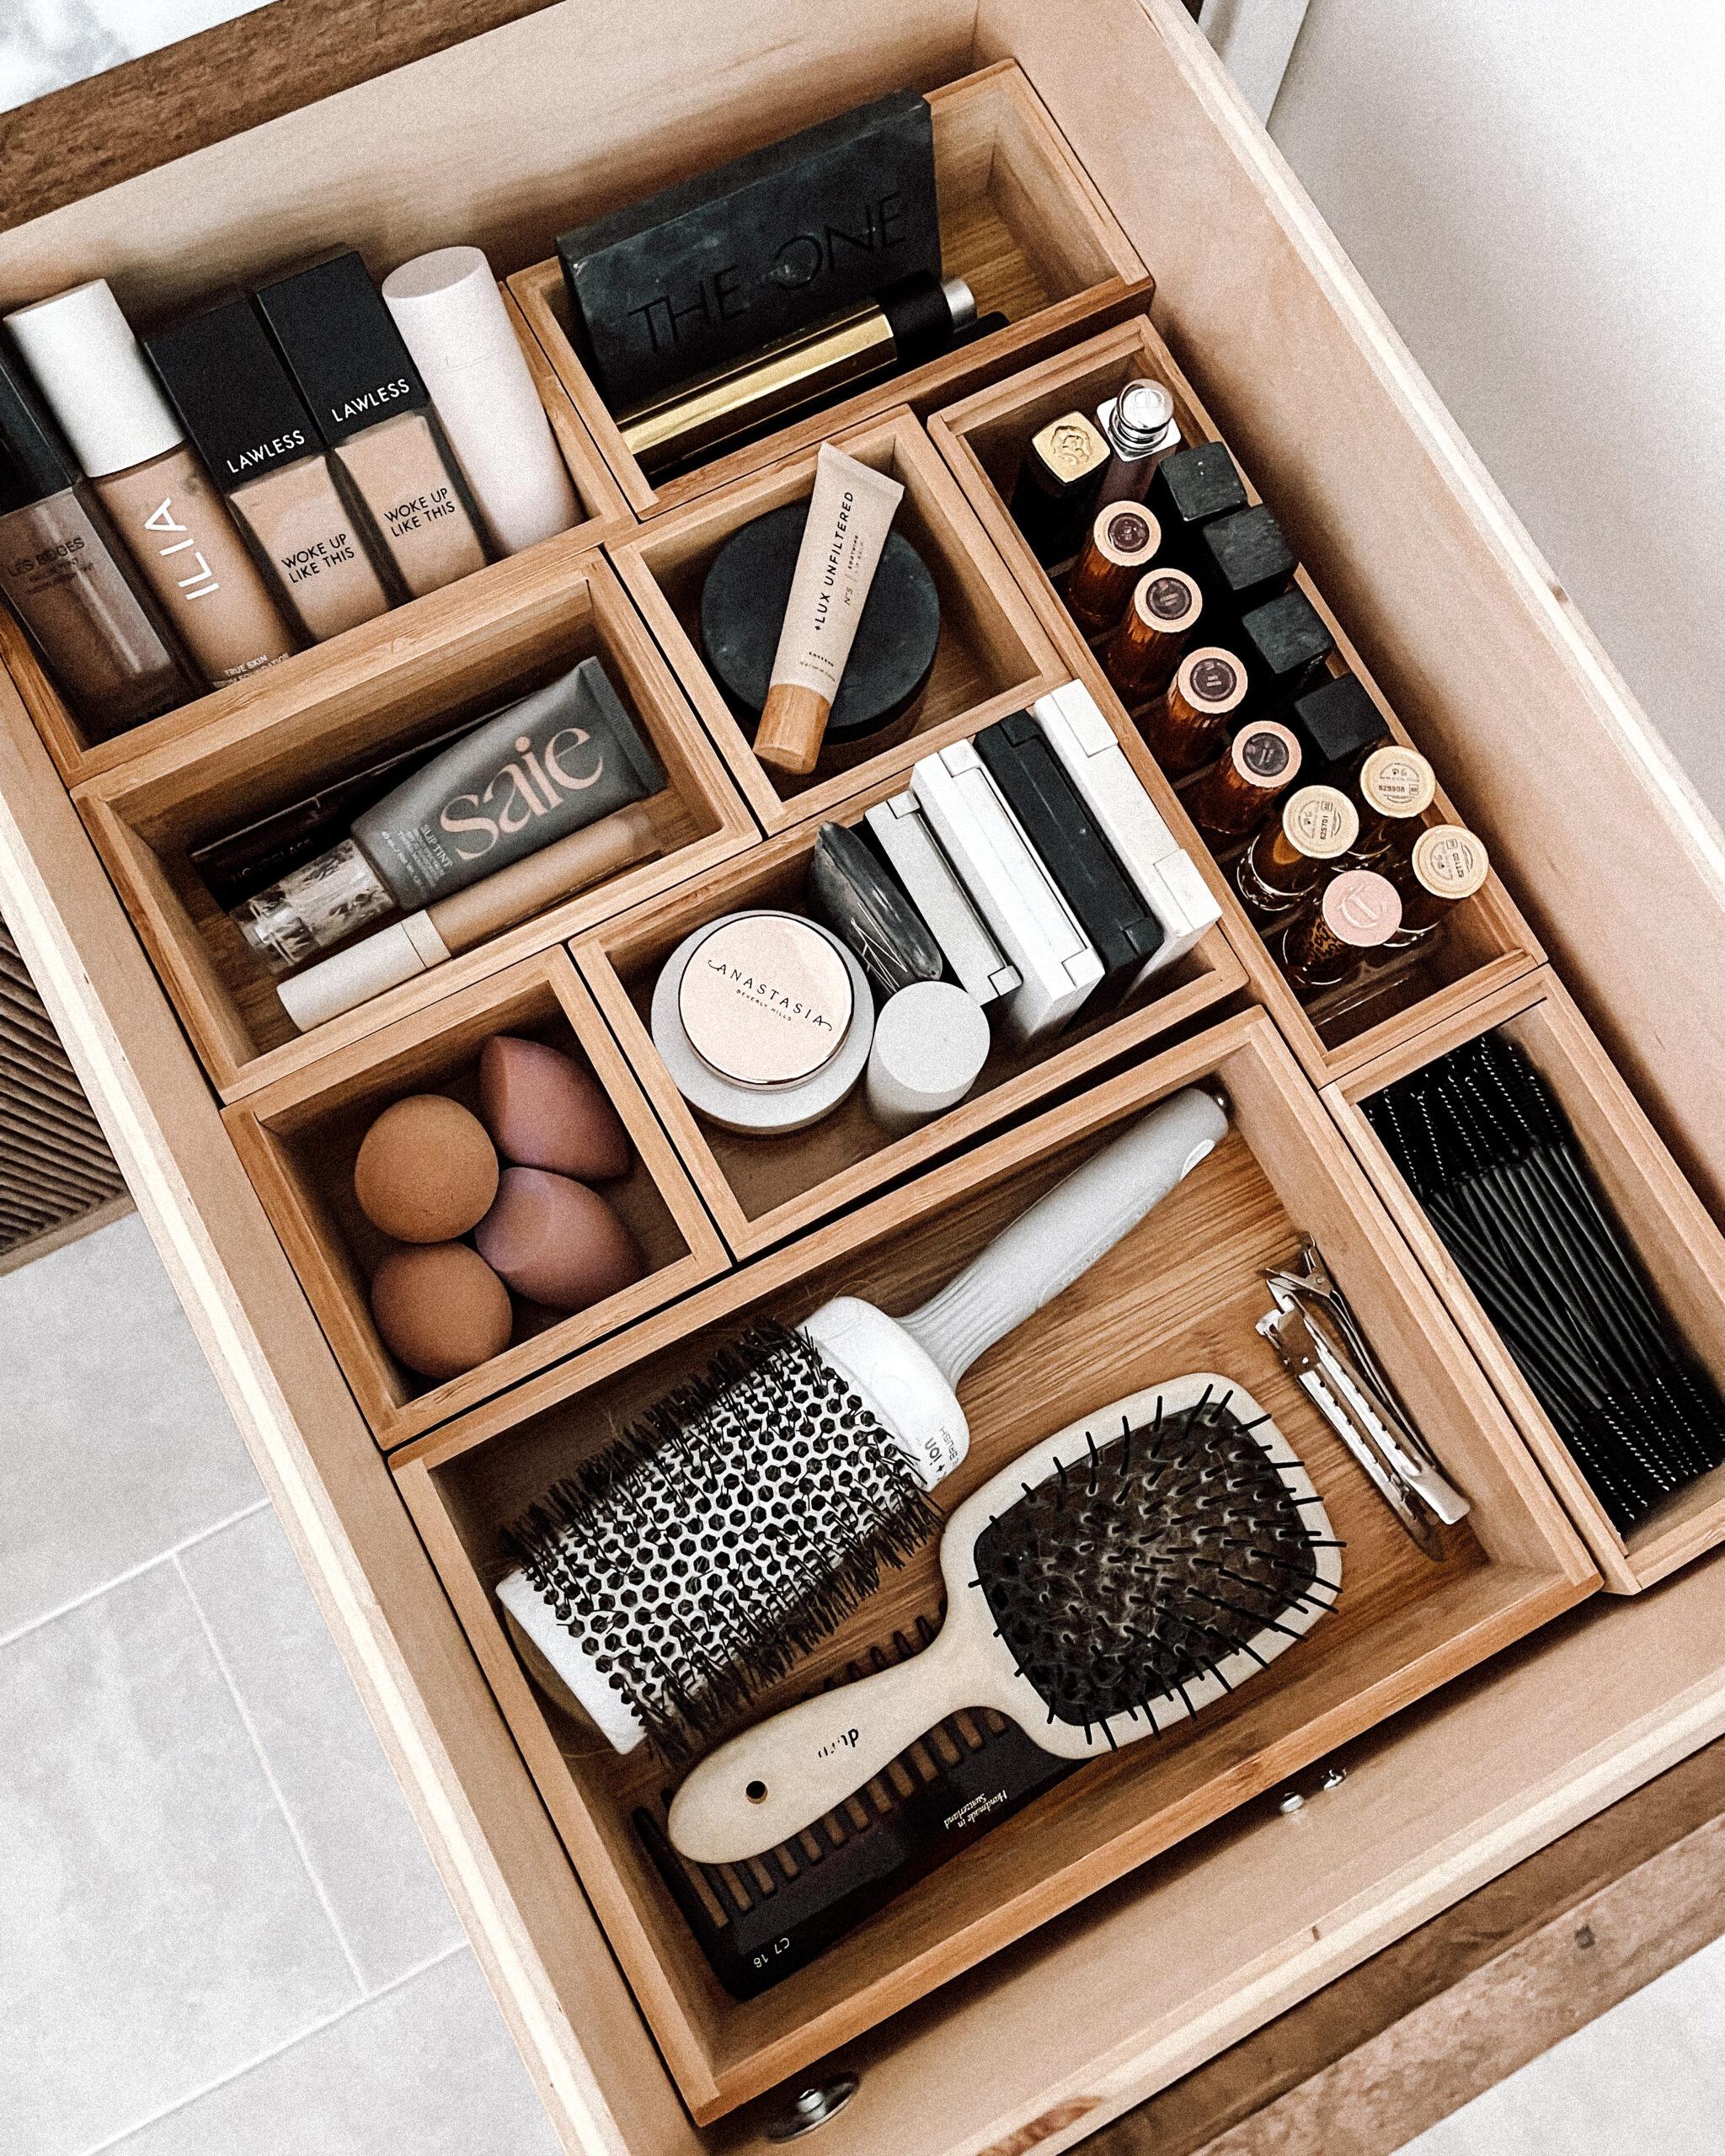 Fashion Jackson Bathroom Drawer Organizers for Makeup